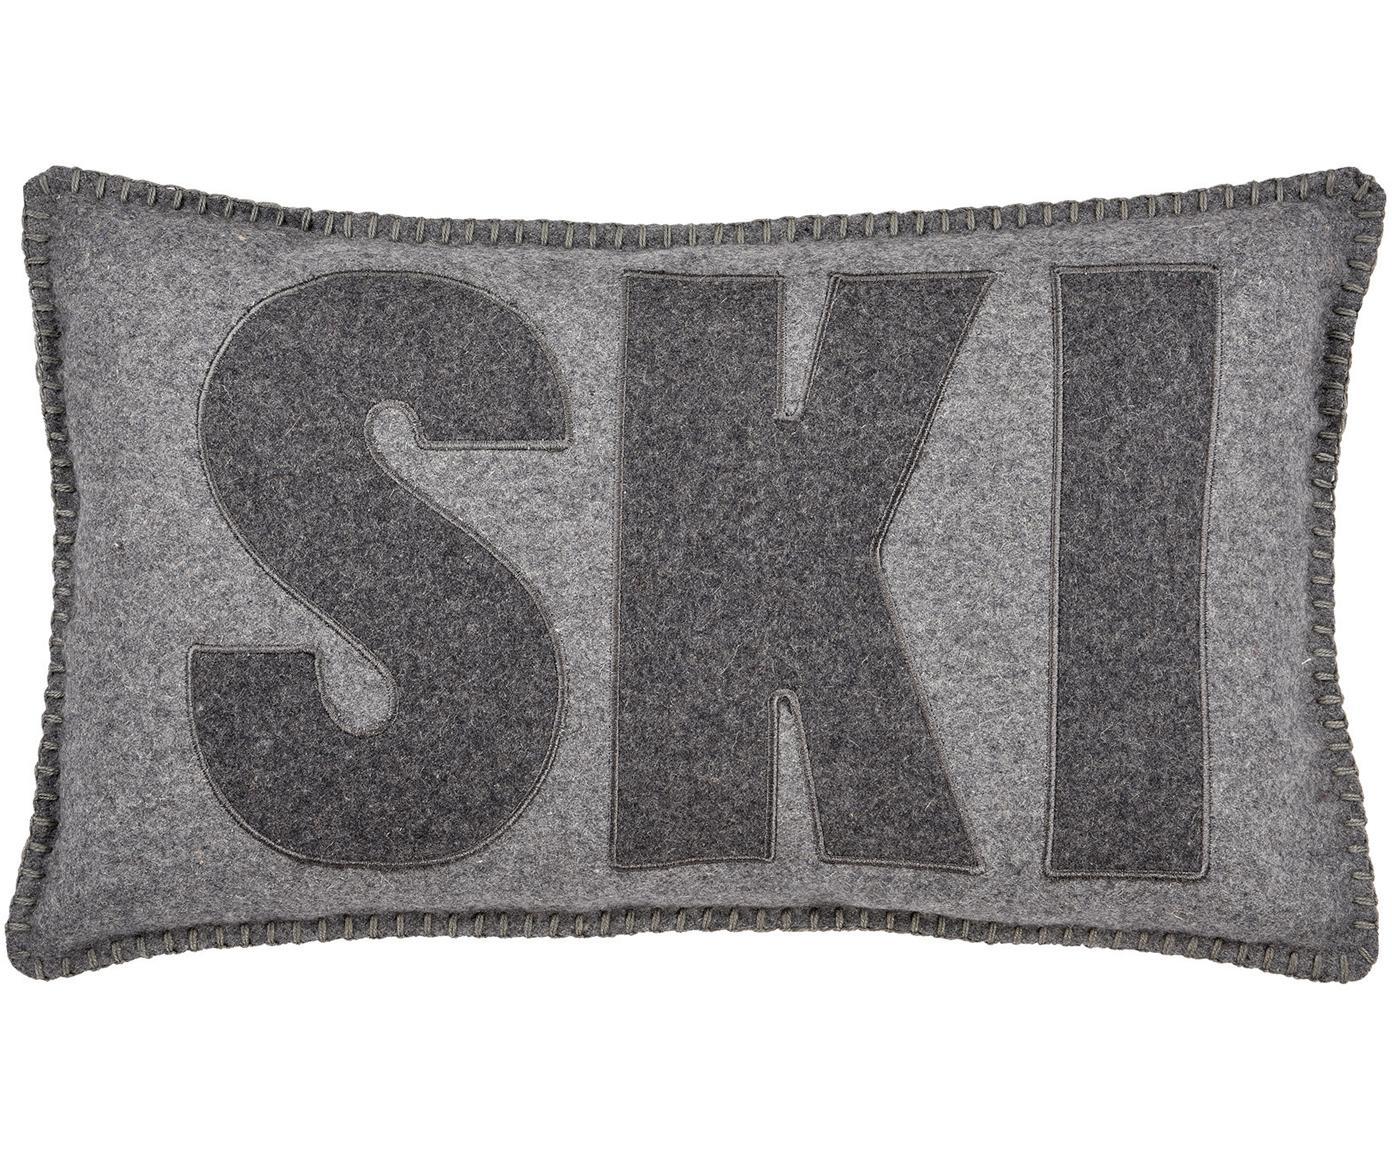 Wolvilten kussenhoes Ski, 60% wol, 40% polyester., Grijs, antraciet, 30 x 50 cm